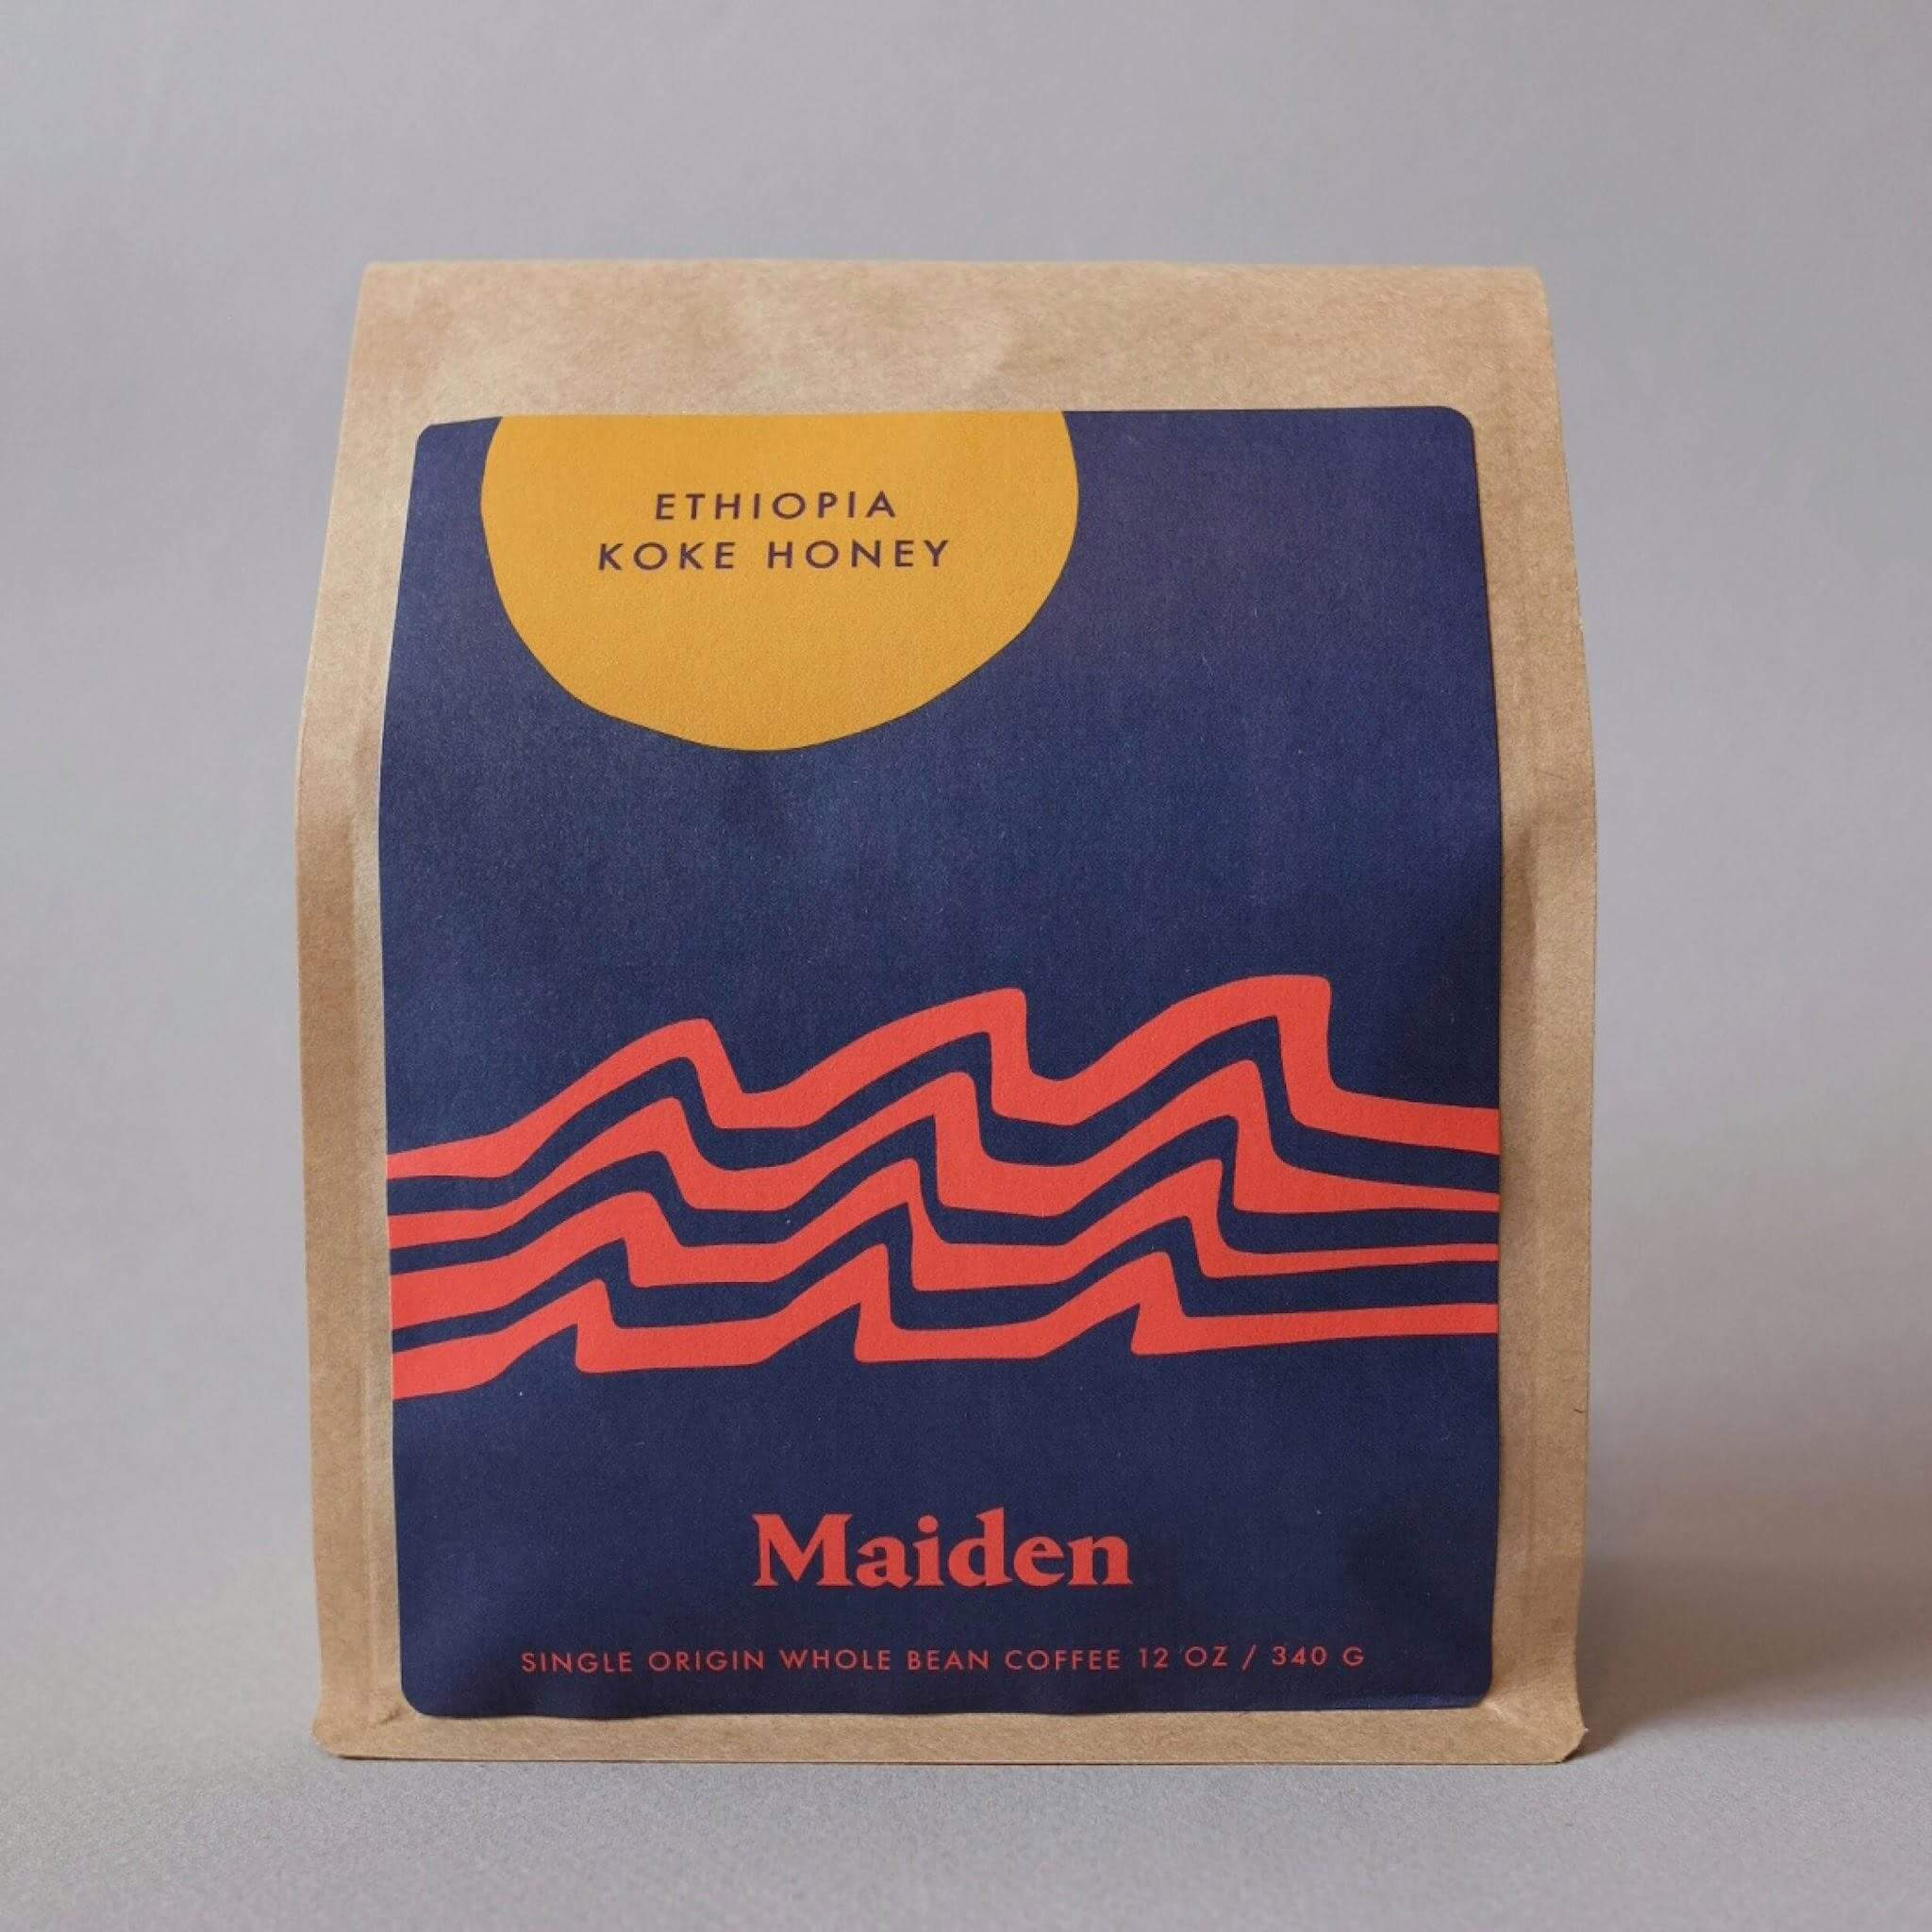 Maiden Coffee Roasters Coffee bags